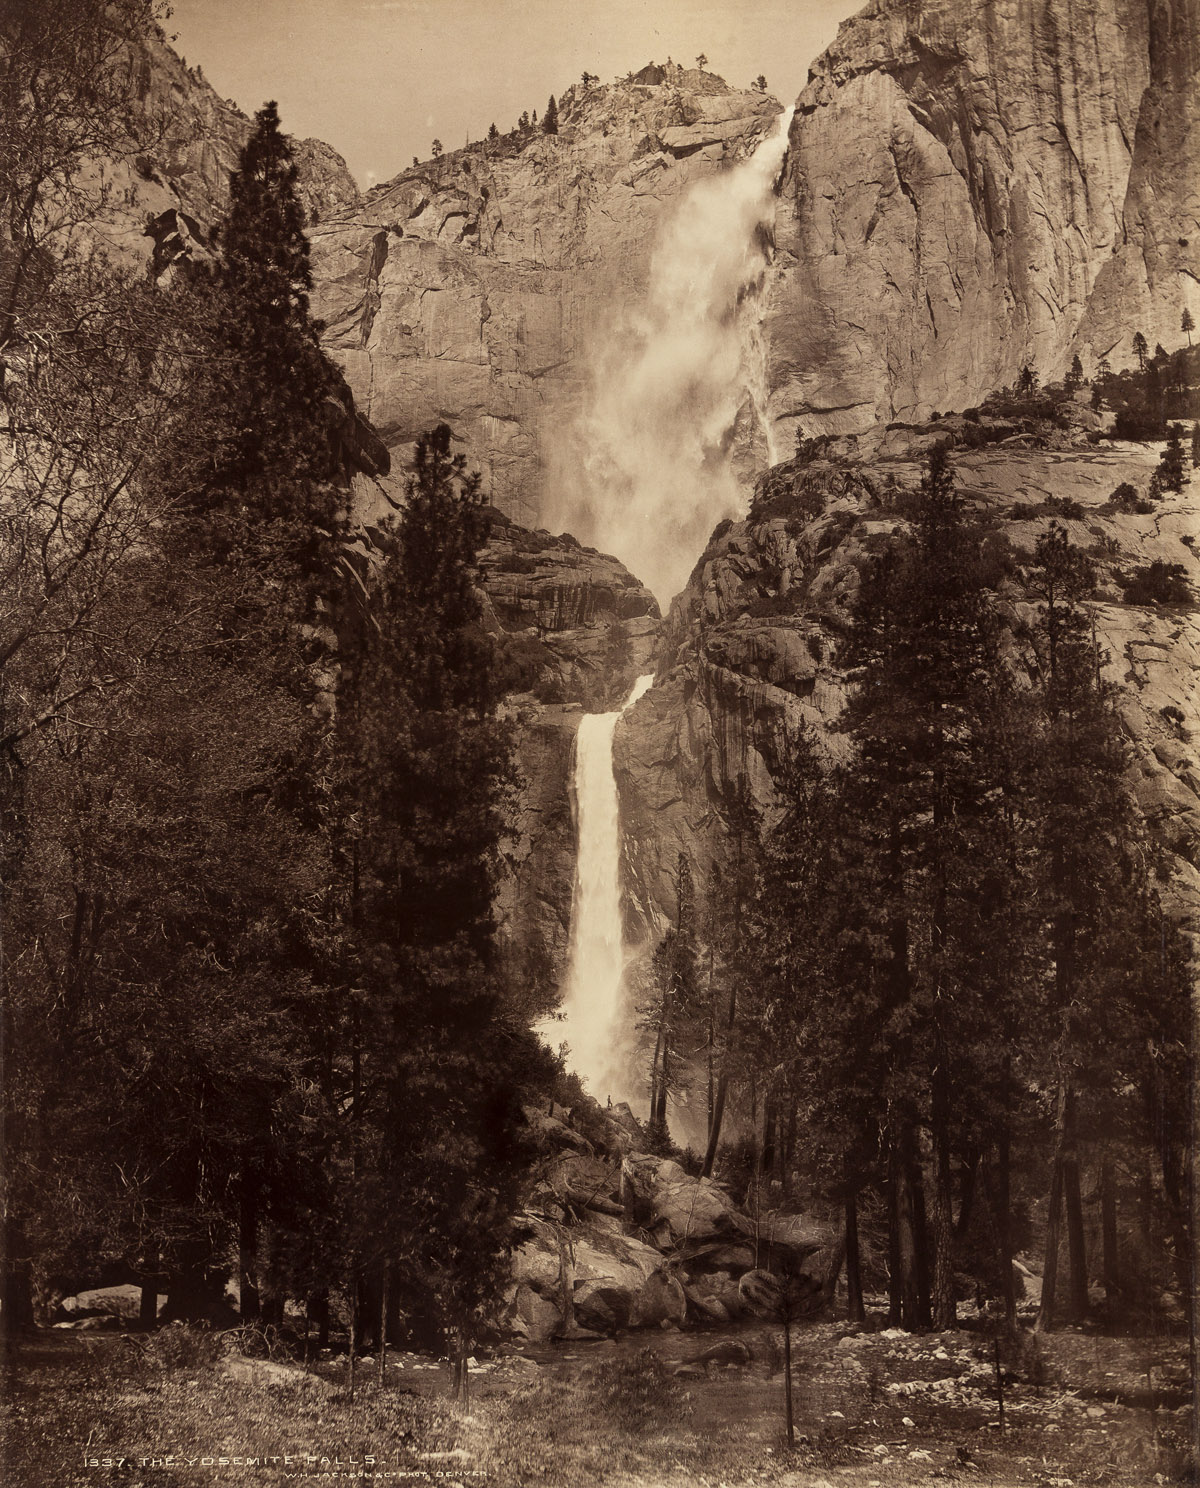 WILLIAM HENRY JACKSON (1843-1942) The Yosemite Falls.